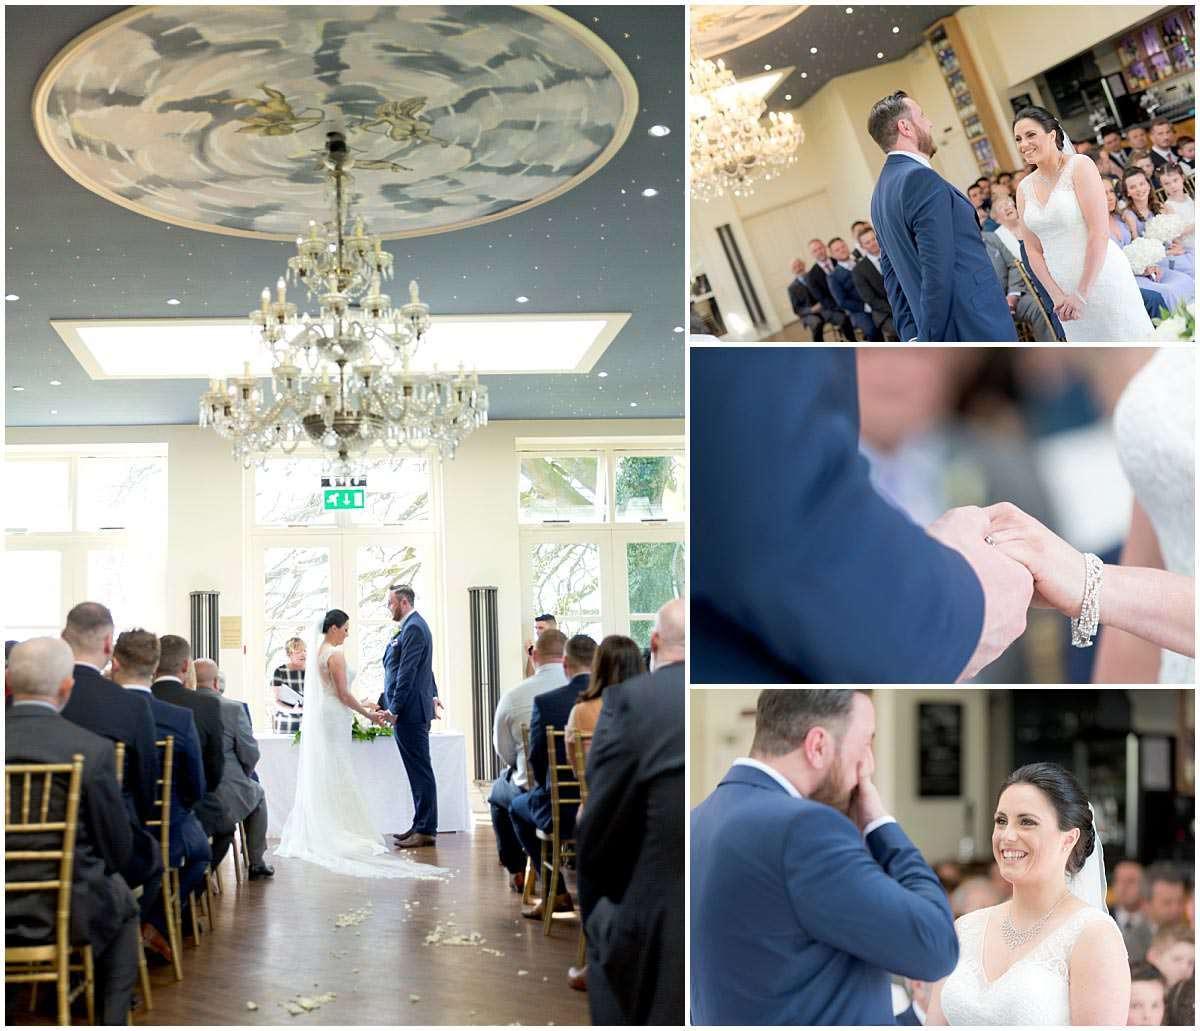 Shottle Hall Wedding Ceremony